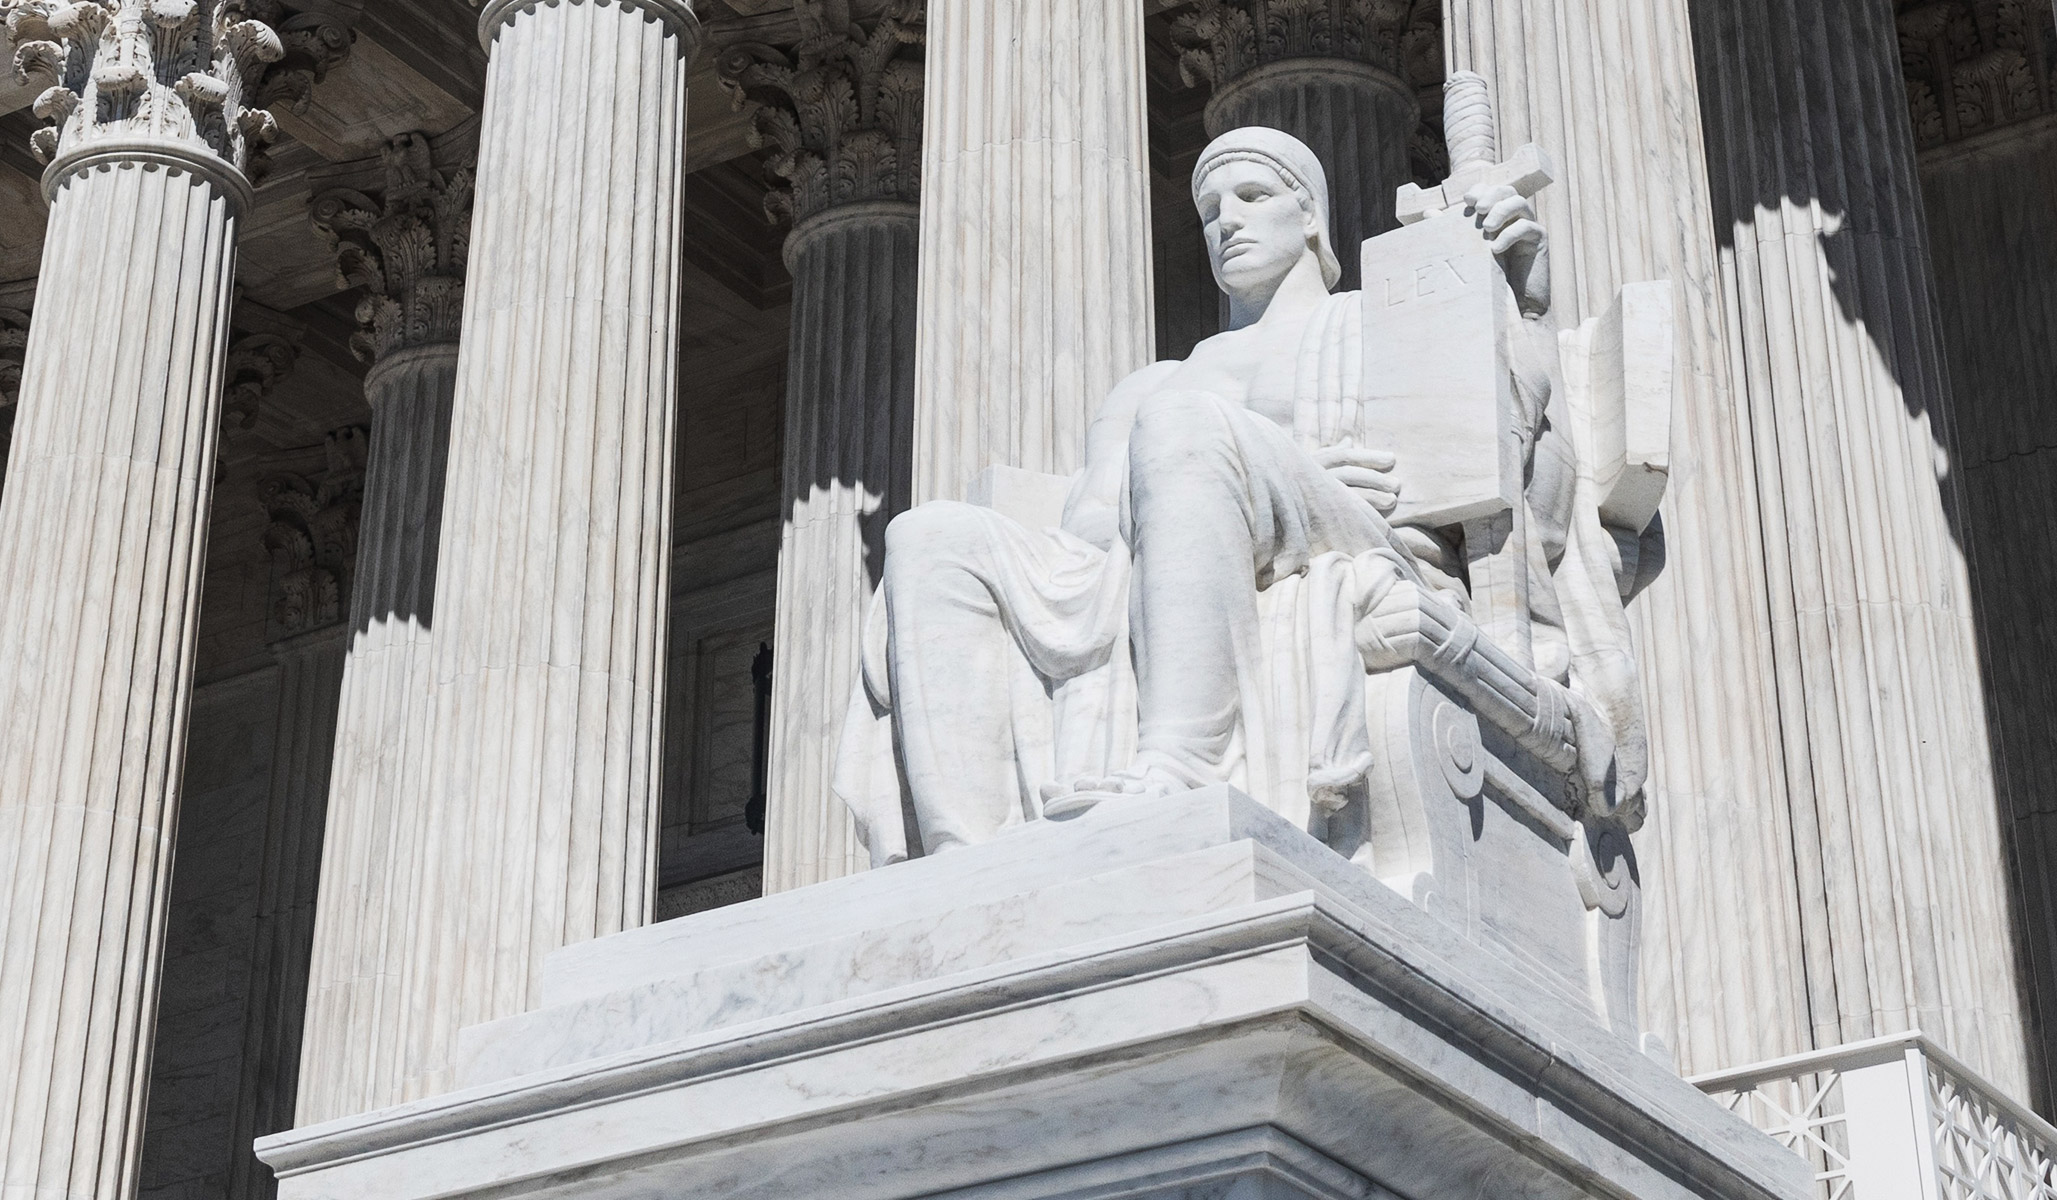 Supreme Court & Brett Kavanaugh: Reducing Overreach